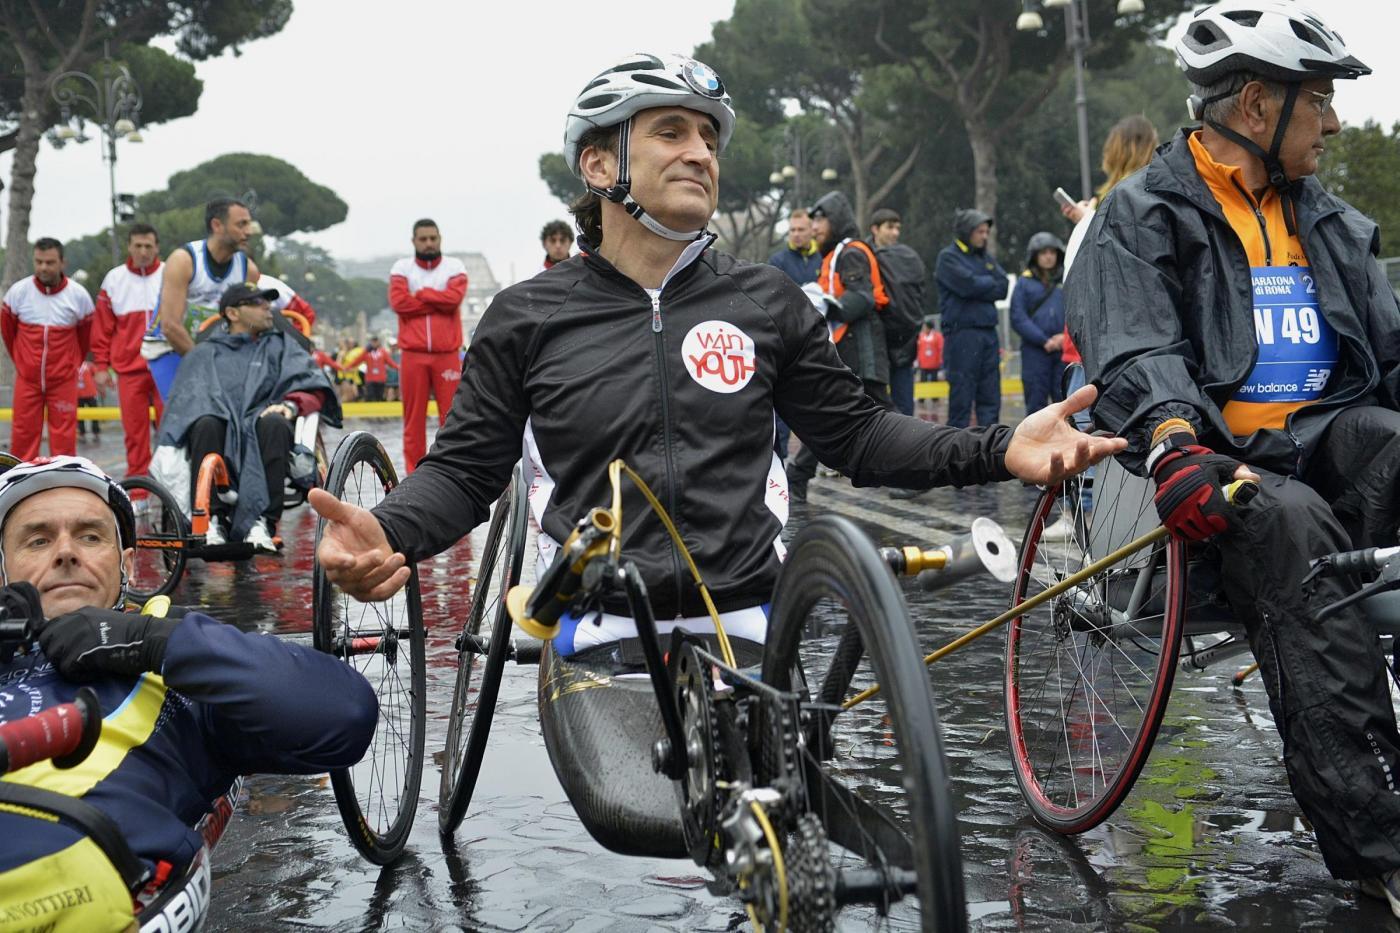 Paralimpiadi 2016: i 101 italiani a Rio de Janeiro